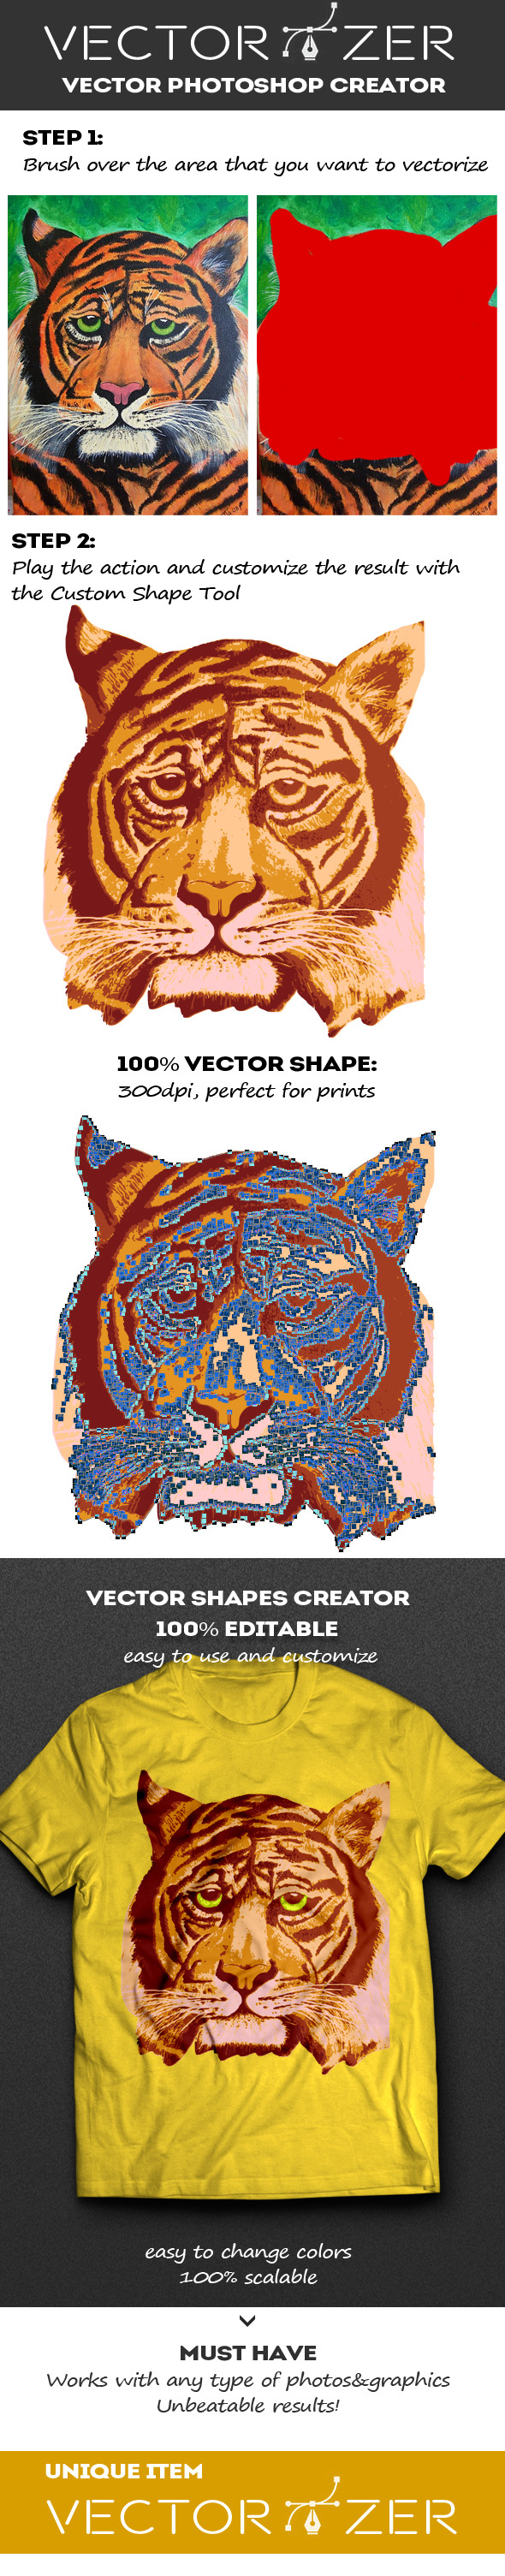 Vectorizer - Vector Photoshop Creator